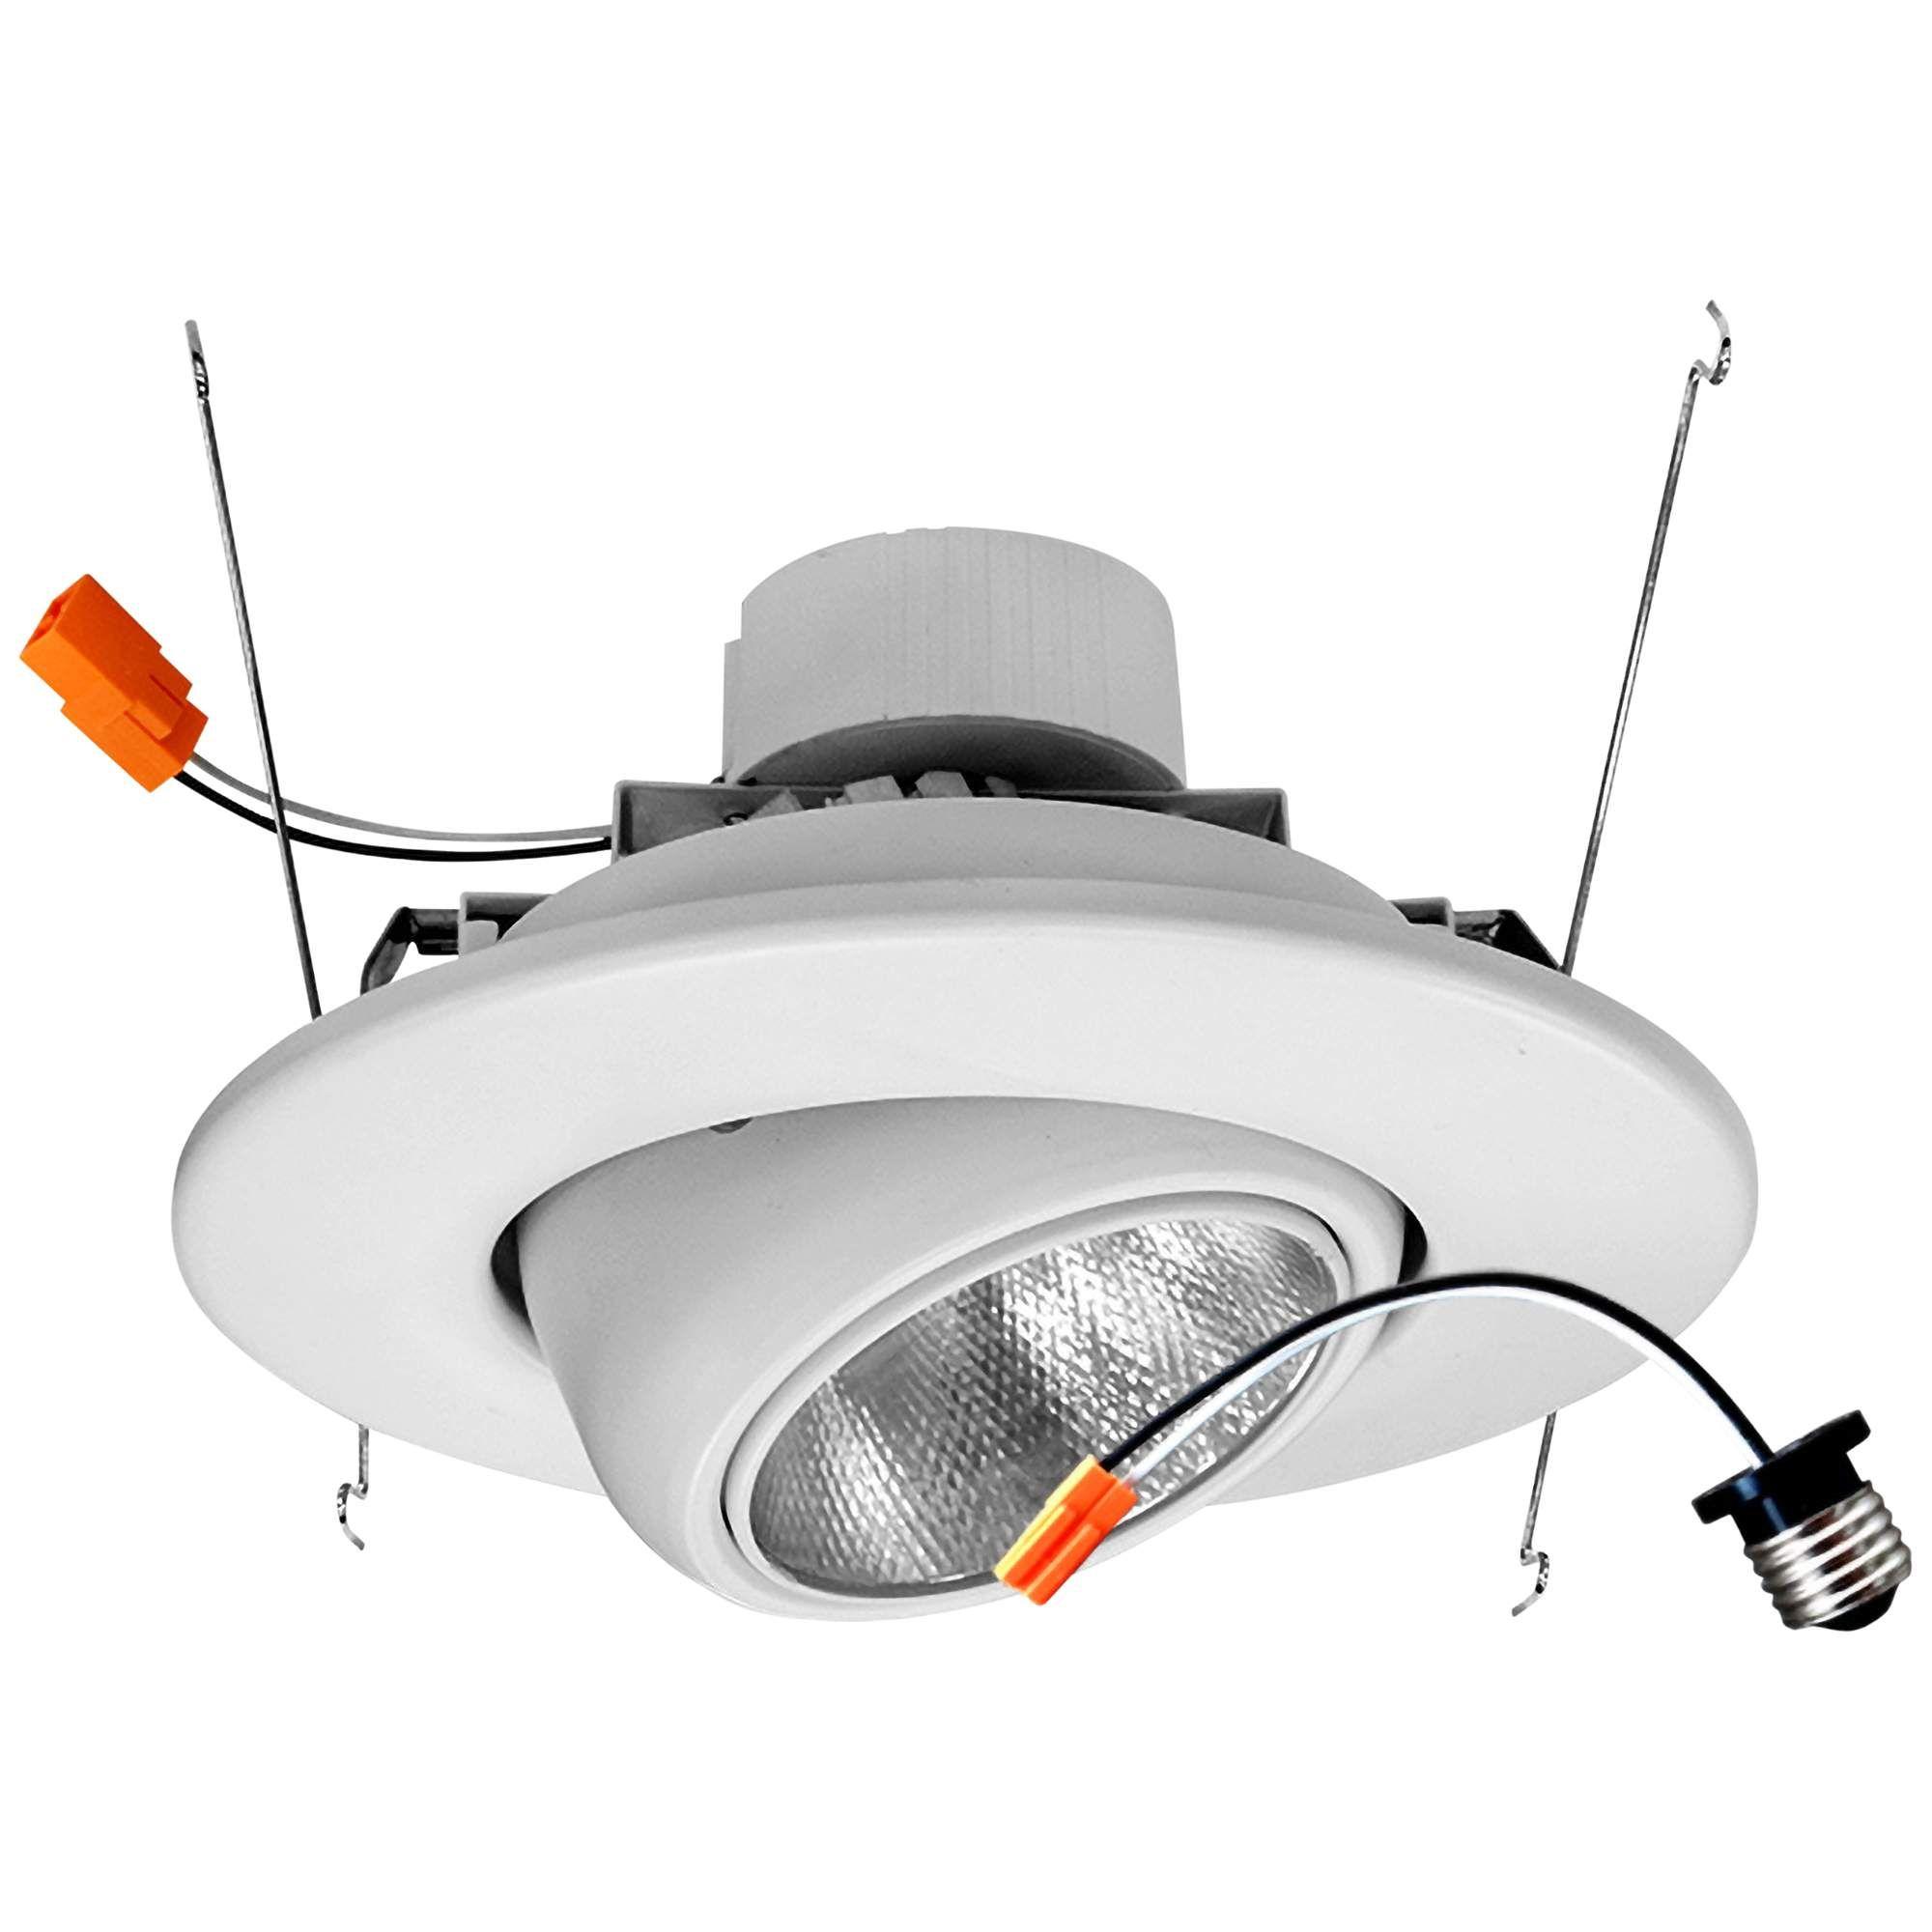 Recessed Lighting 6 White Eyeball 19 Watt Led Retrofit Trim Recessed Lighting Kitchen Recessed Lighting Recessed Spotlights